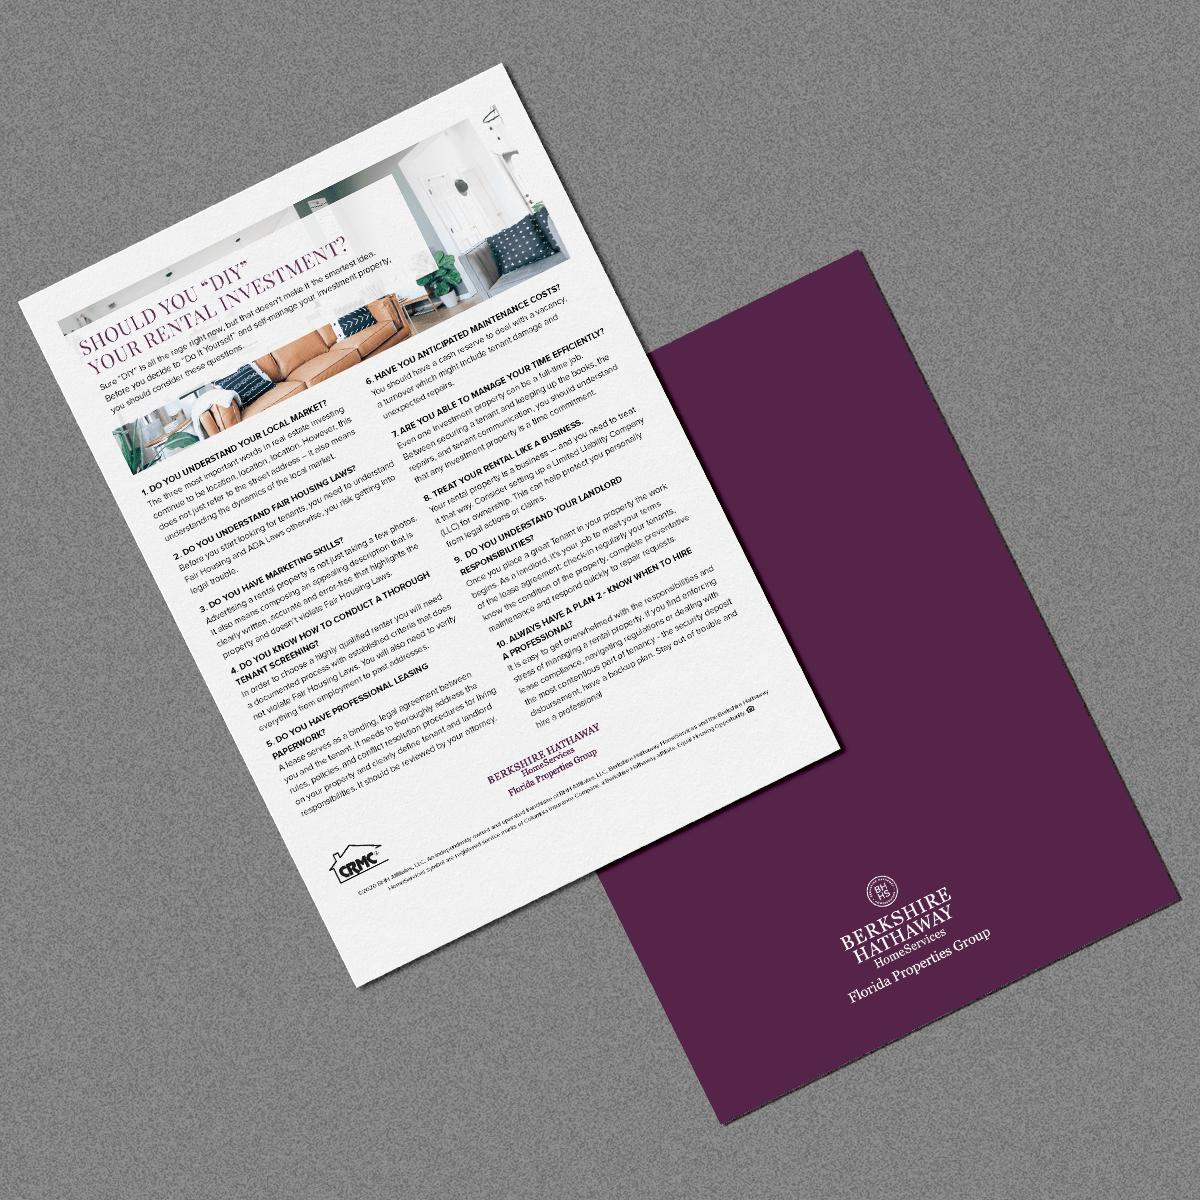 property management DIY flyer preview